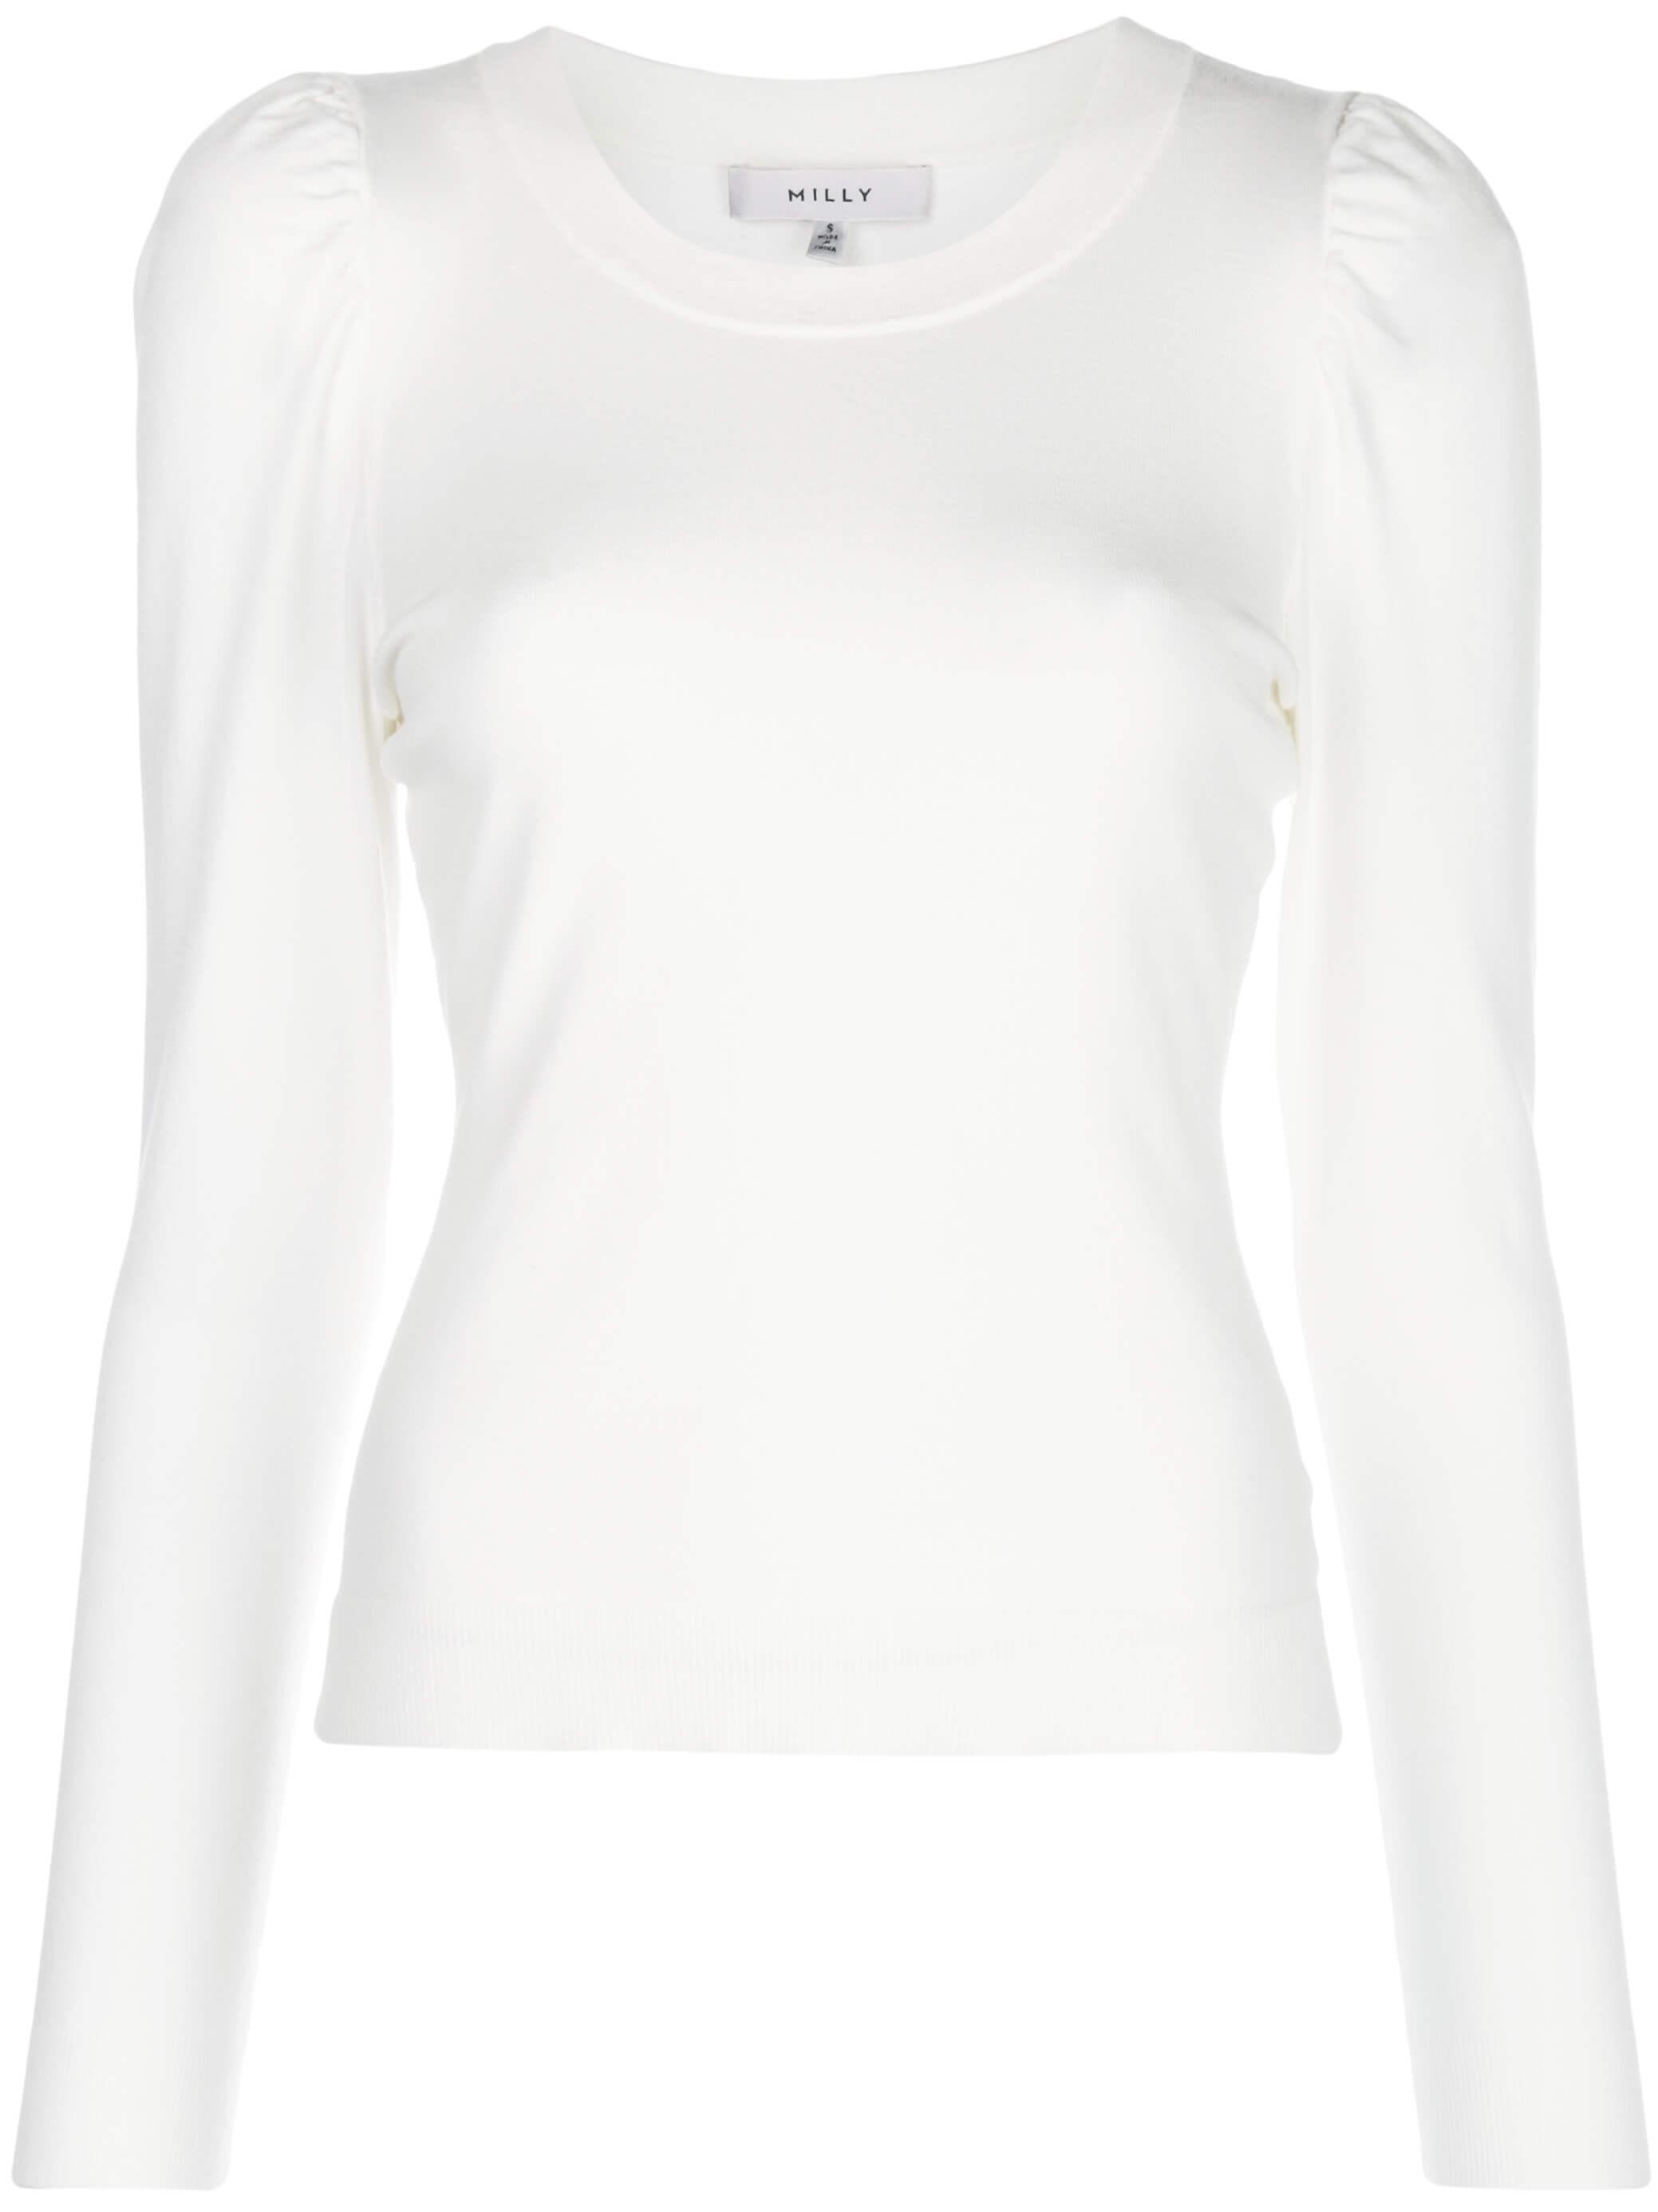 Puff Shoulder Long Sleeve Knit Pullover Item # KPT006